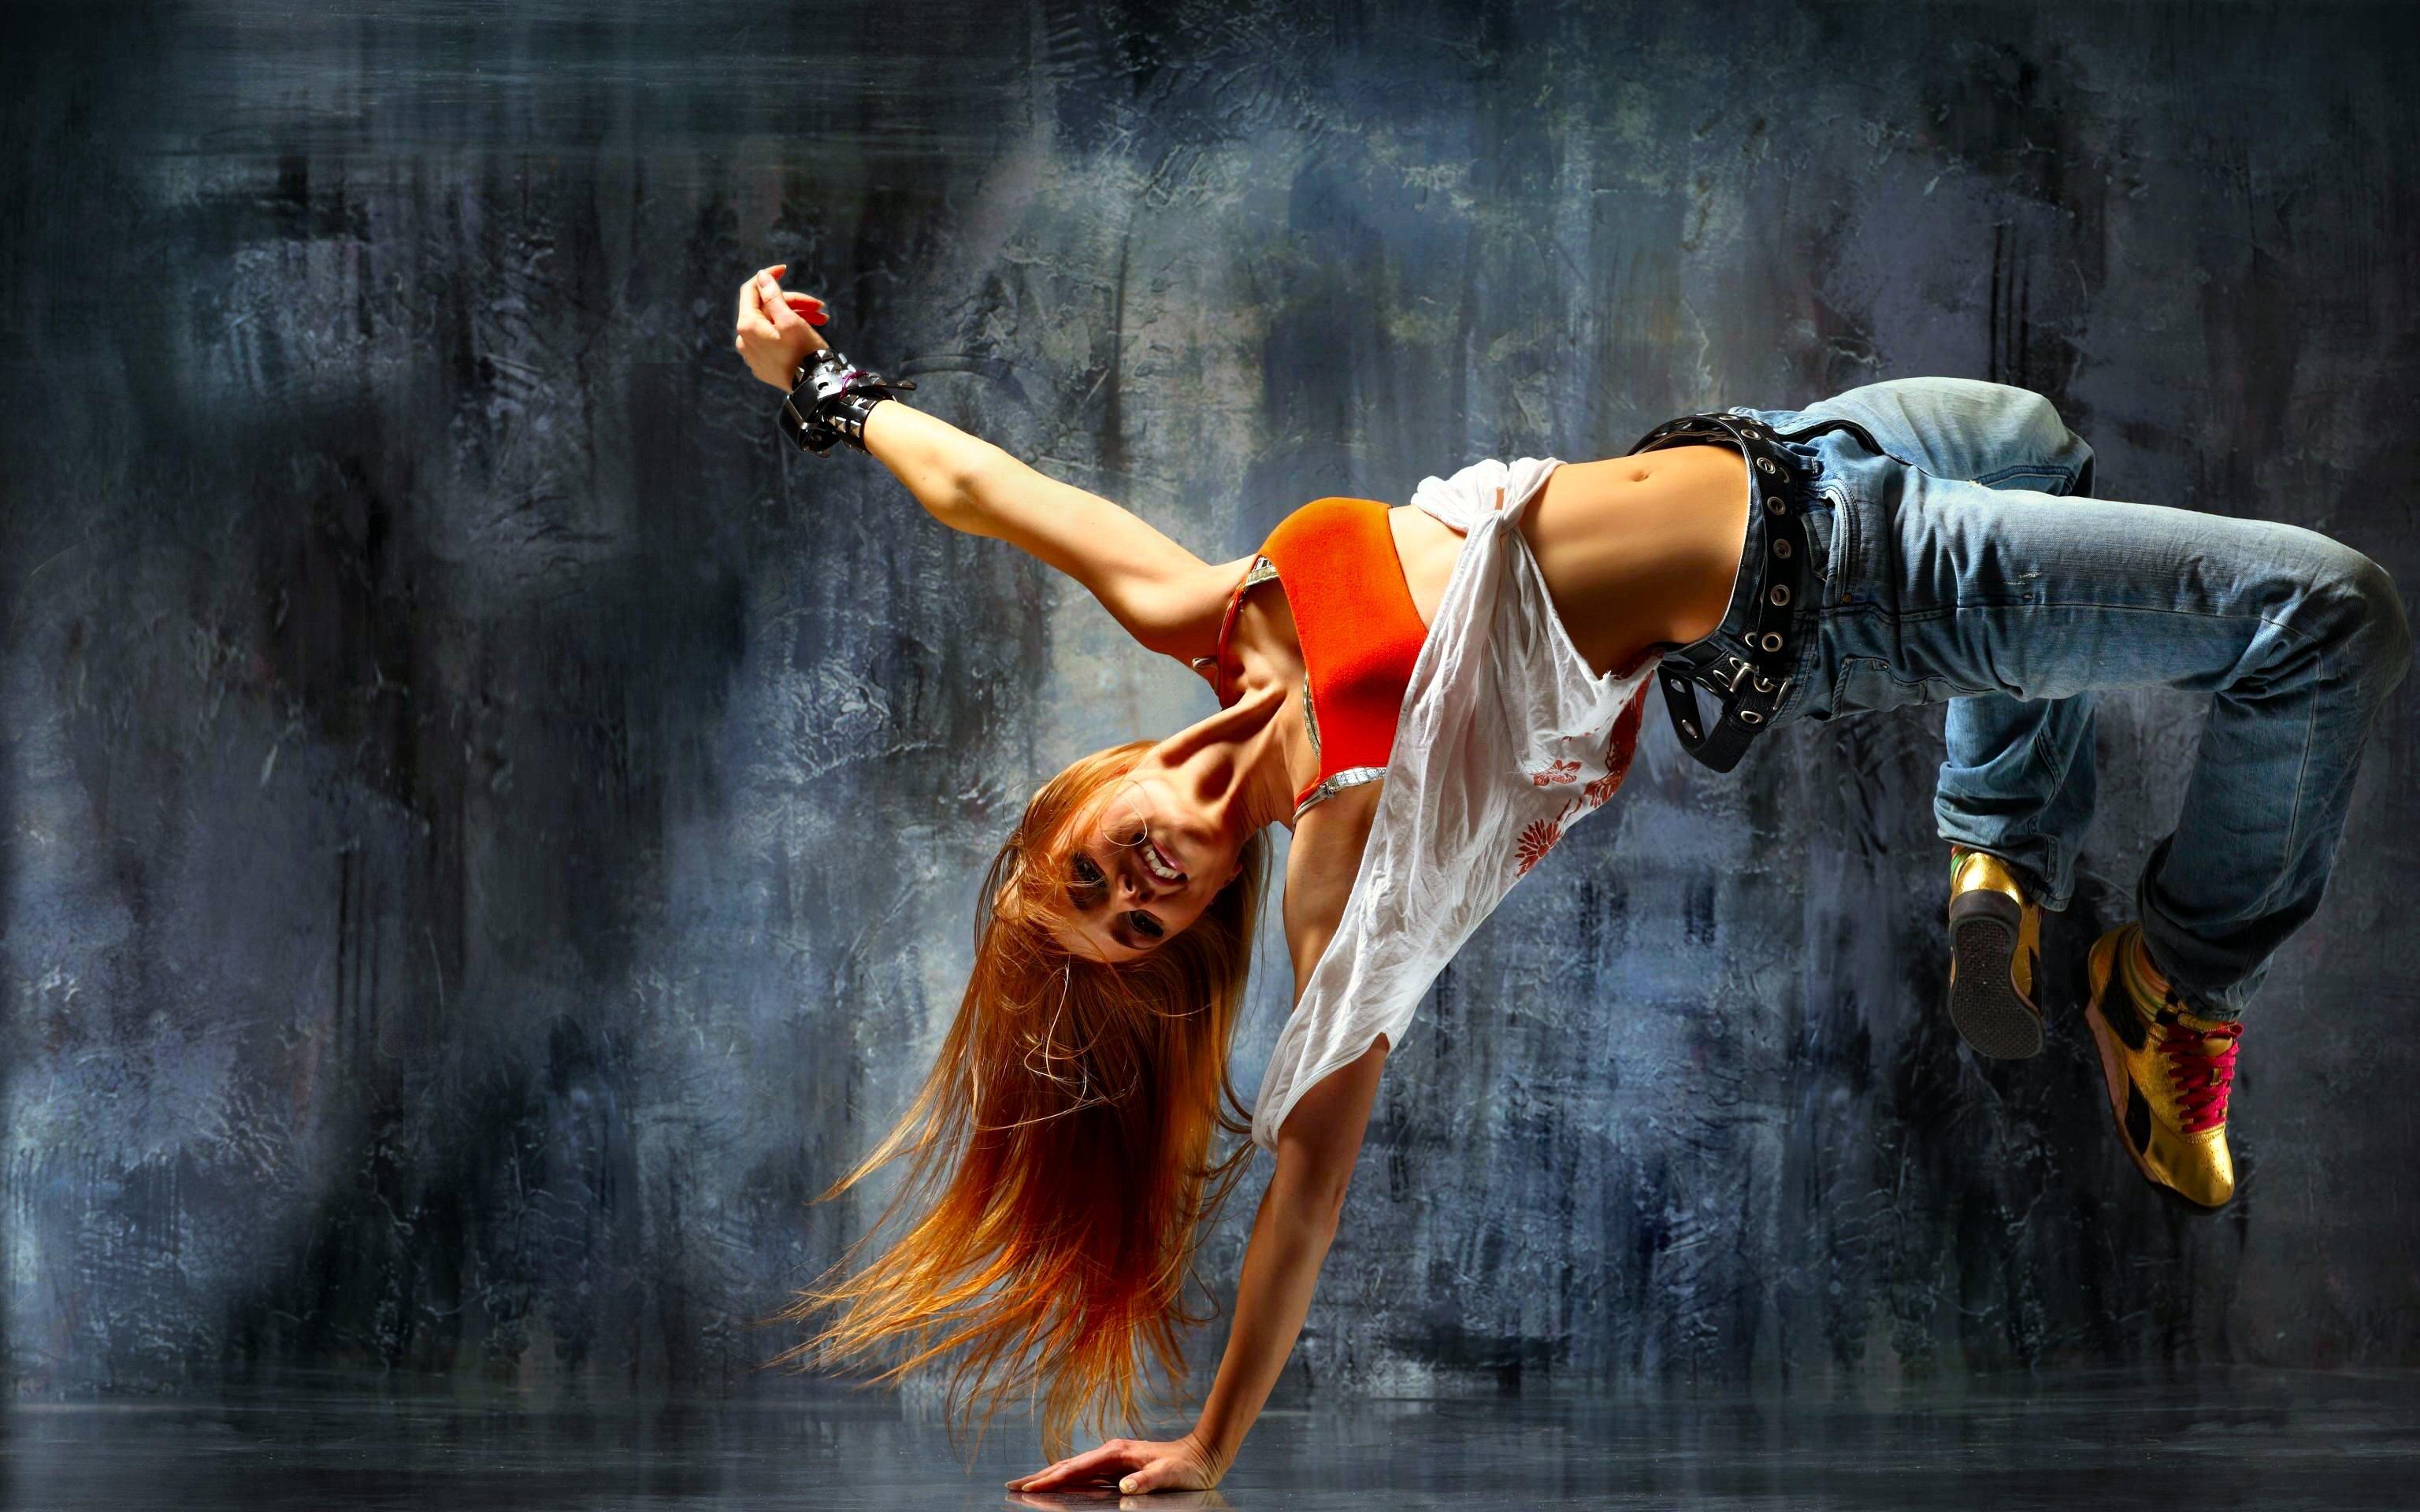 break dance dancing hip hop rap street urban breakdance